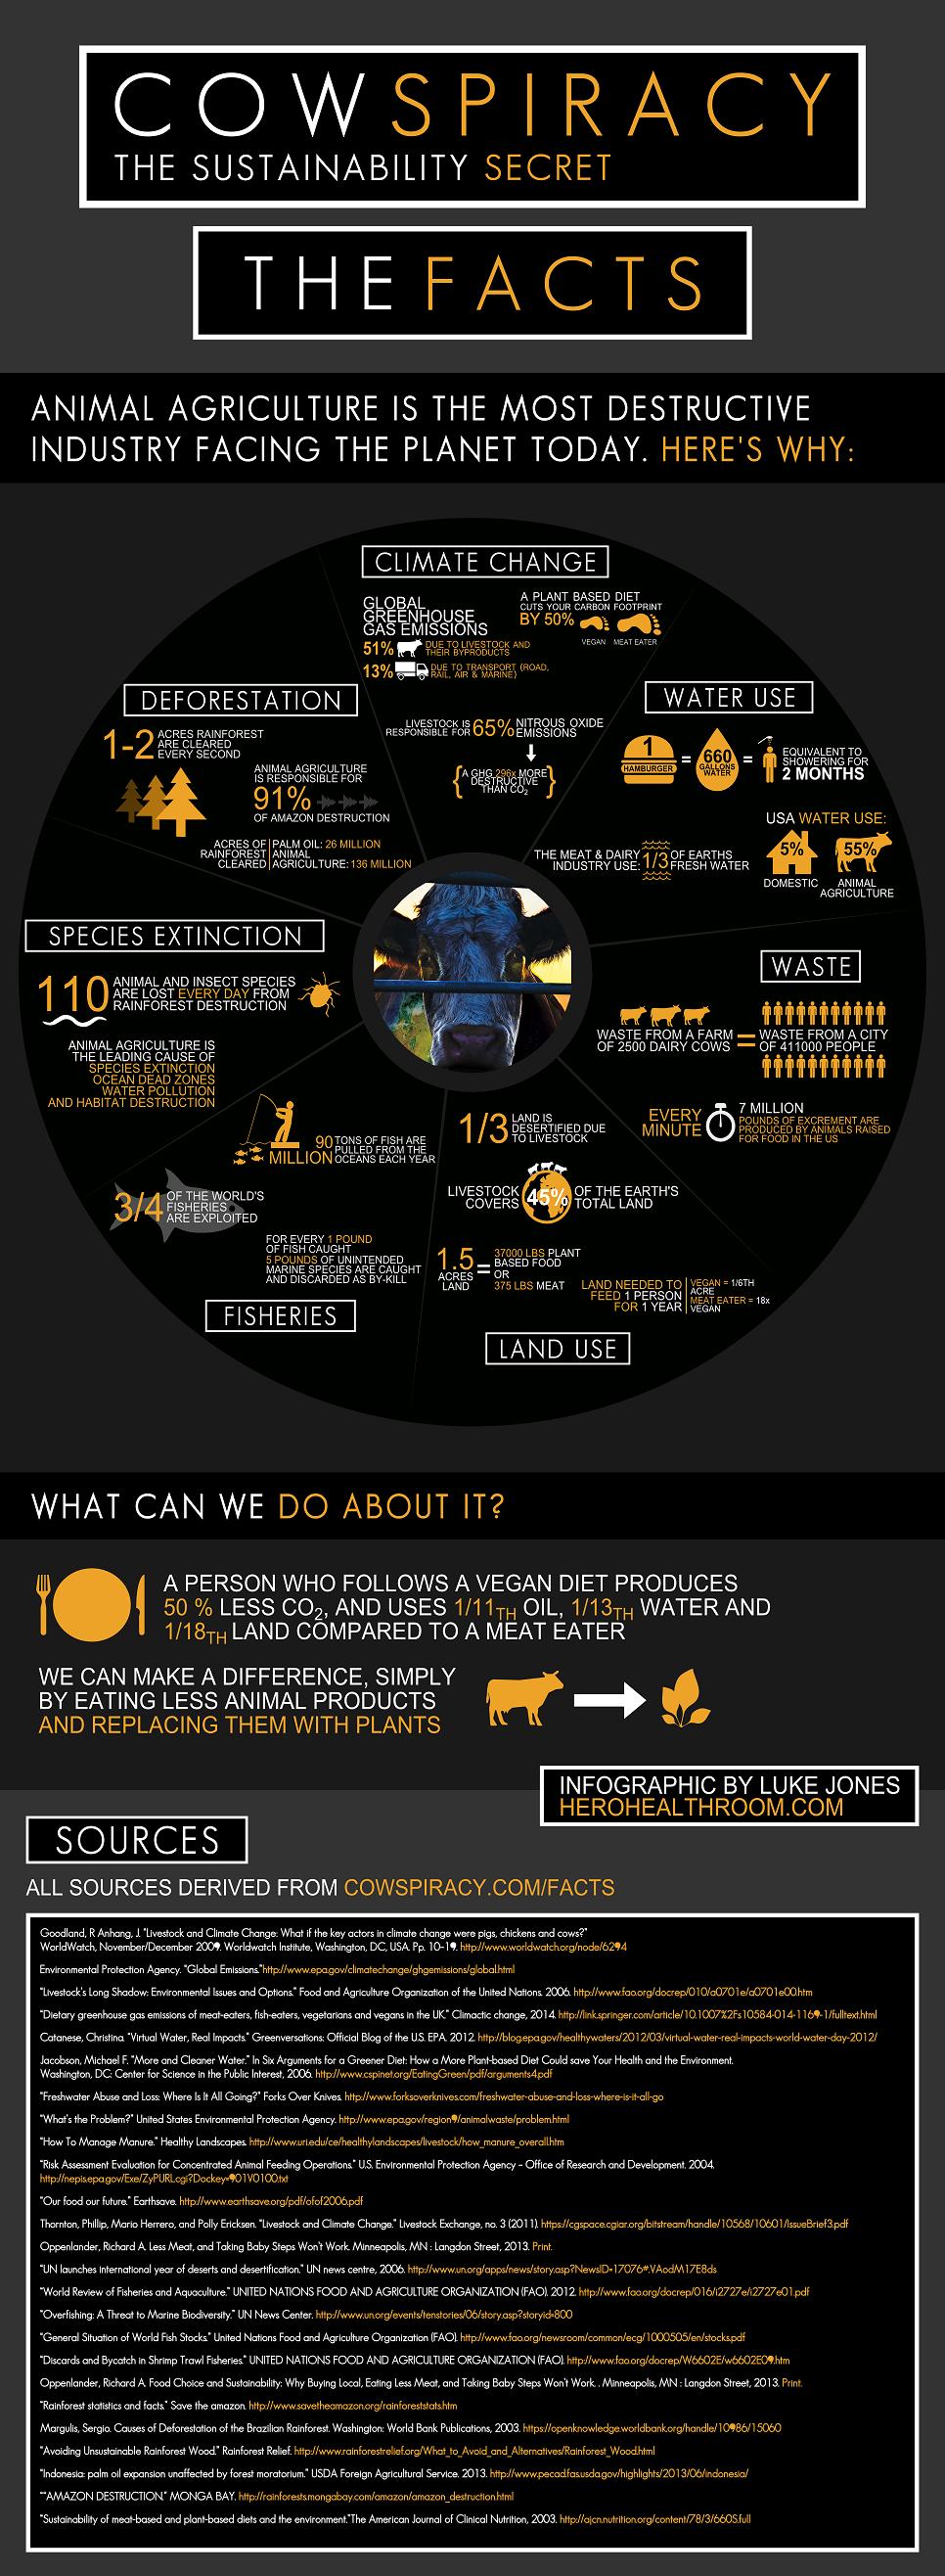 luke-jones-cowspiracy-infographic-imperial-updated